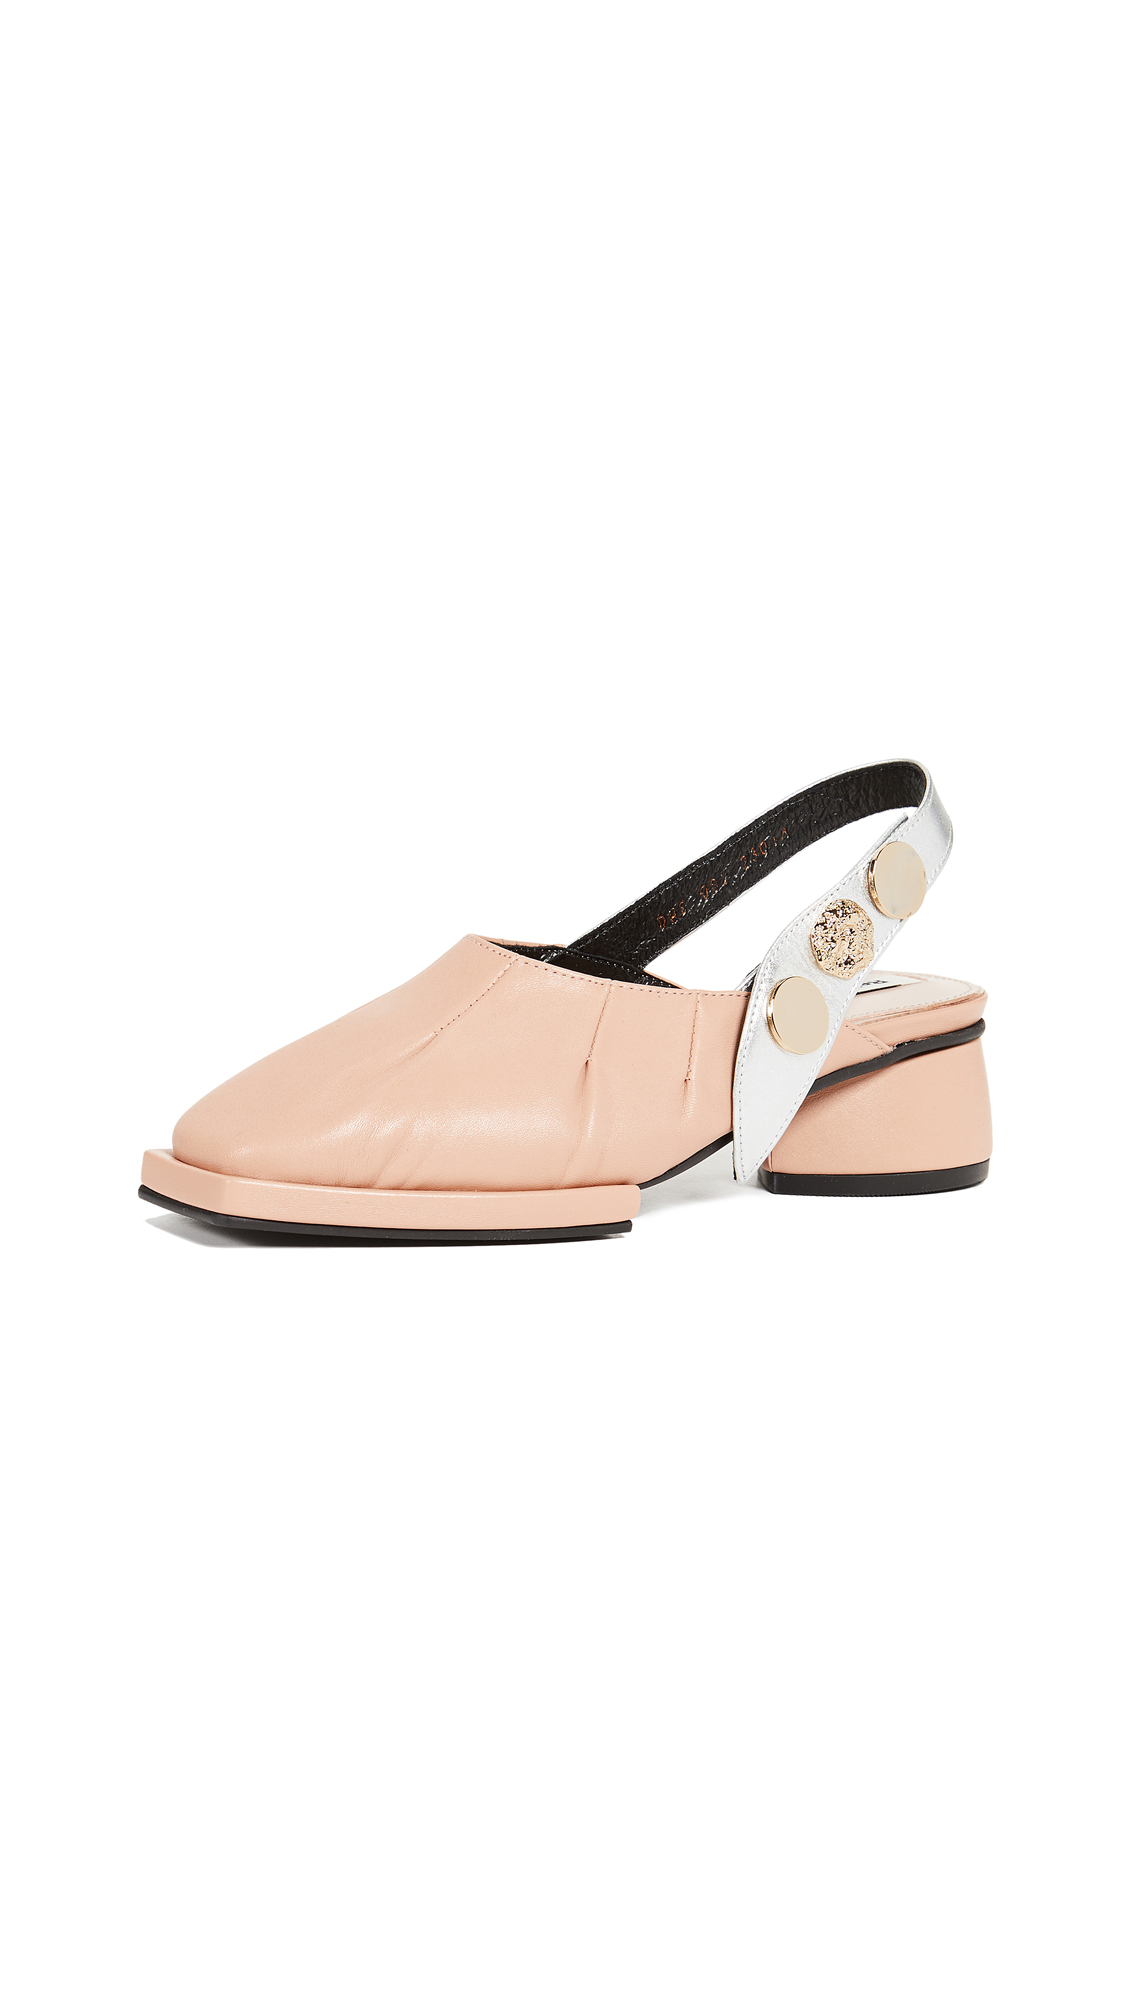 Reike Nen Slingback Pumps - Pale Pink/Silver